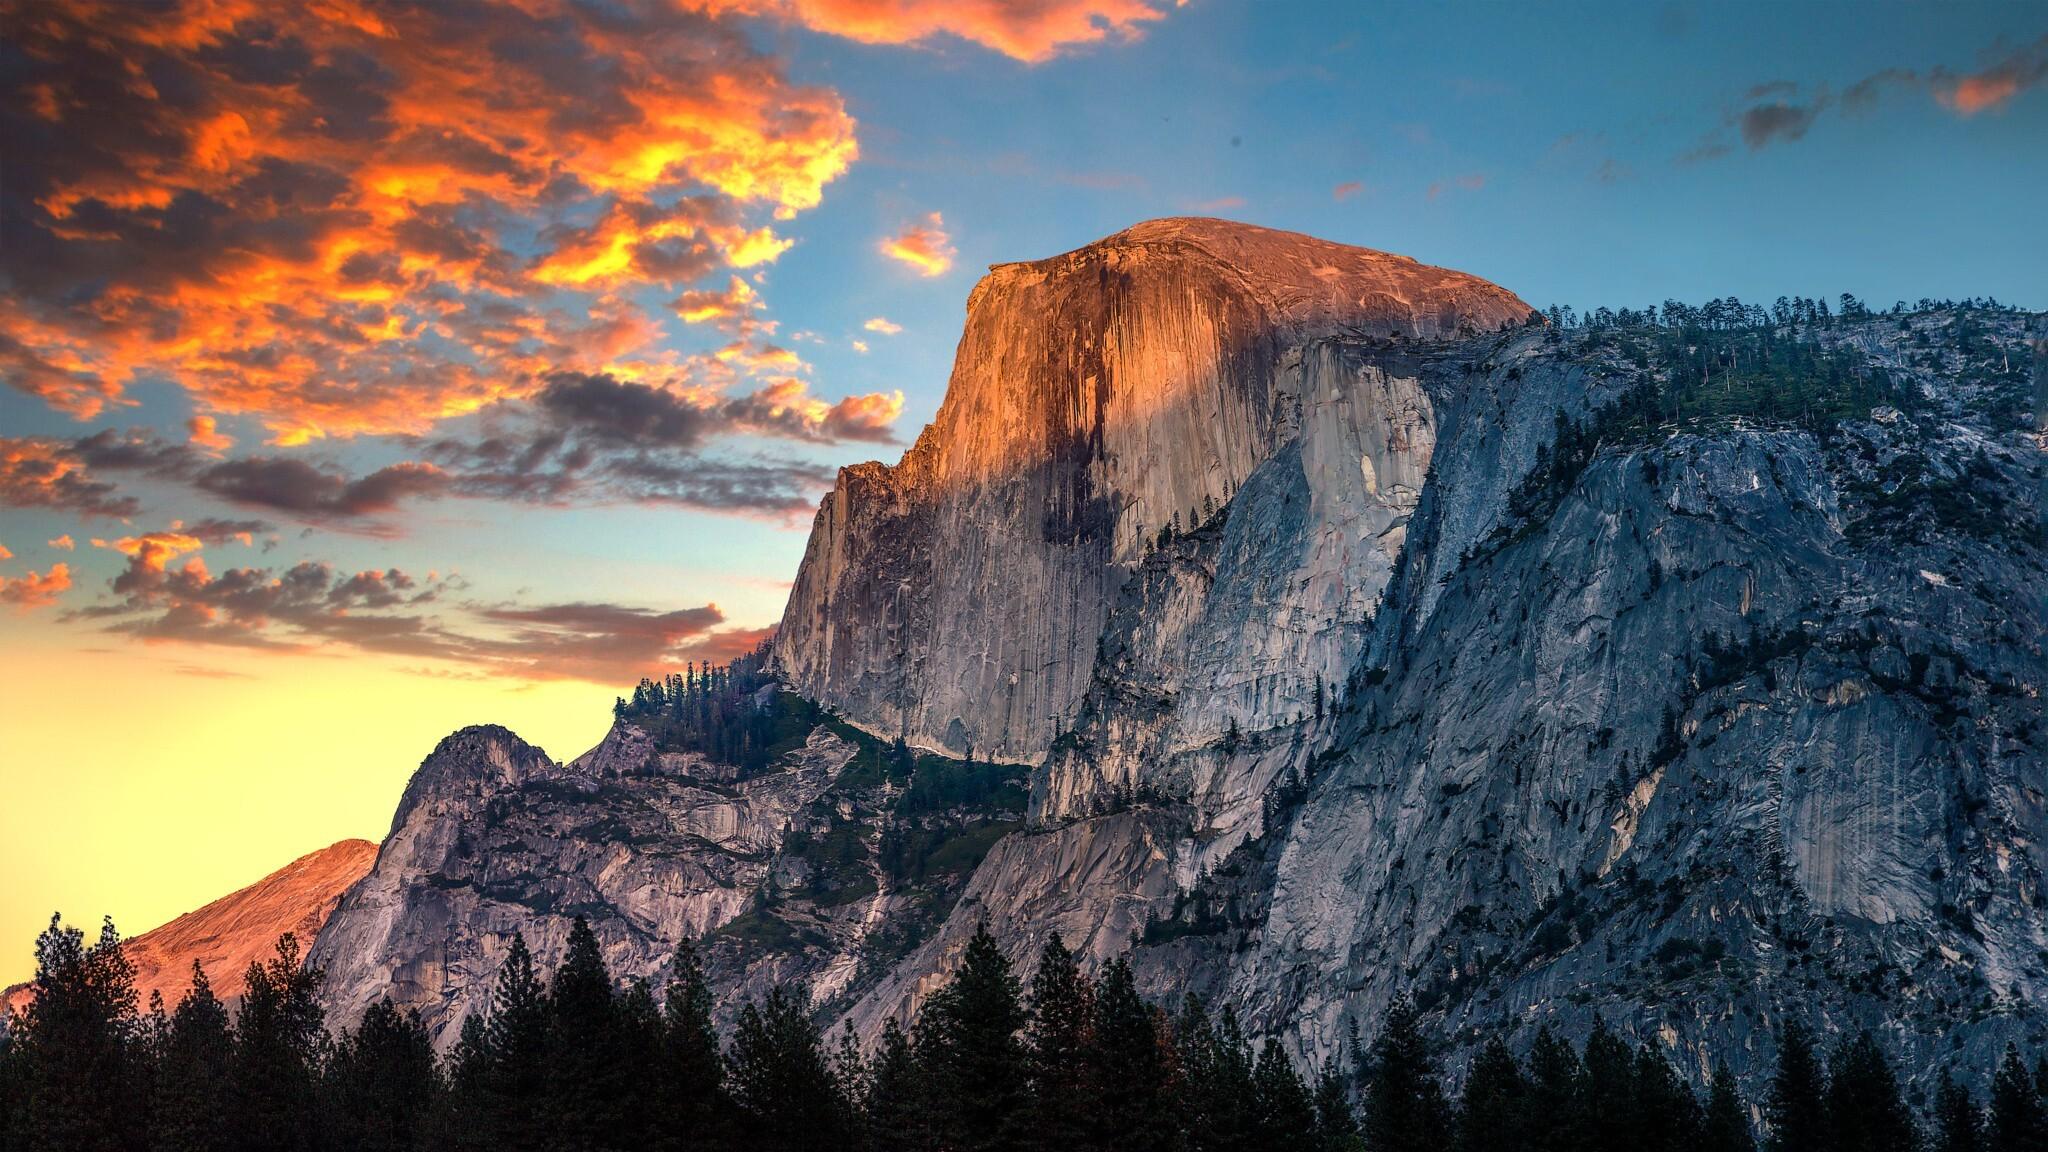 2048x1152 Beautiful Mountains 2048x1152 Resolution Hd 4k Wallpapers